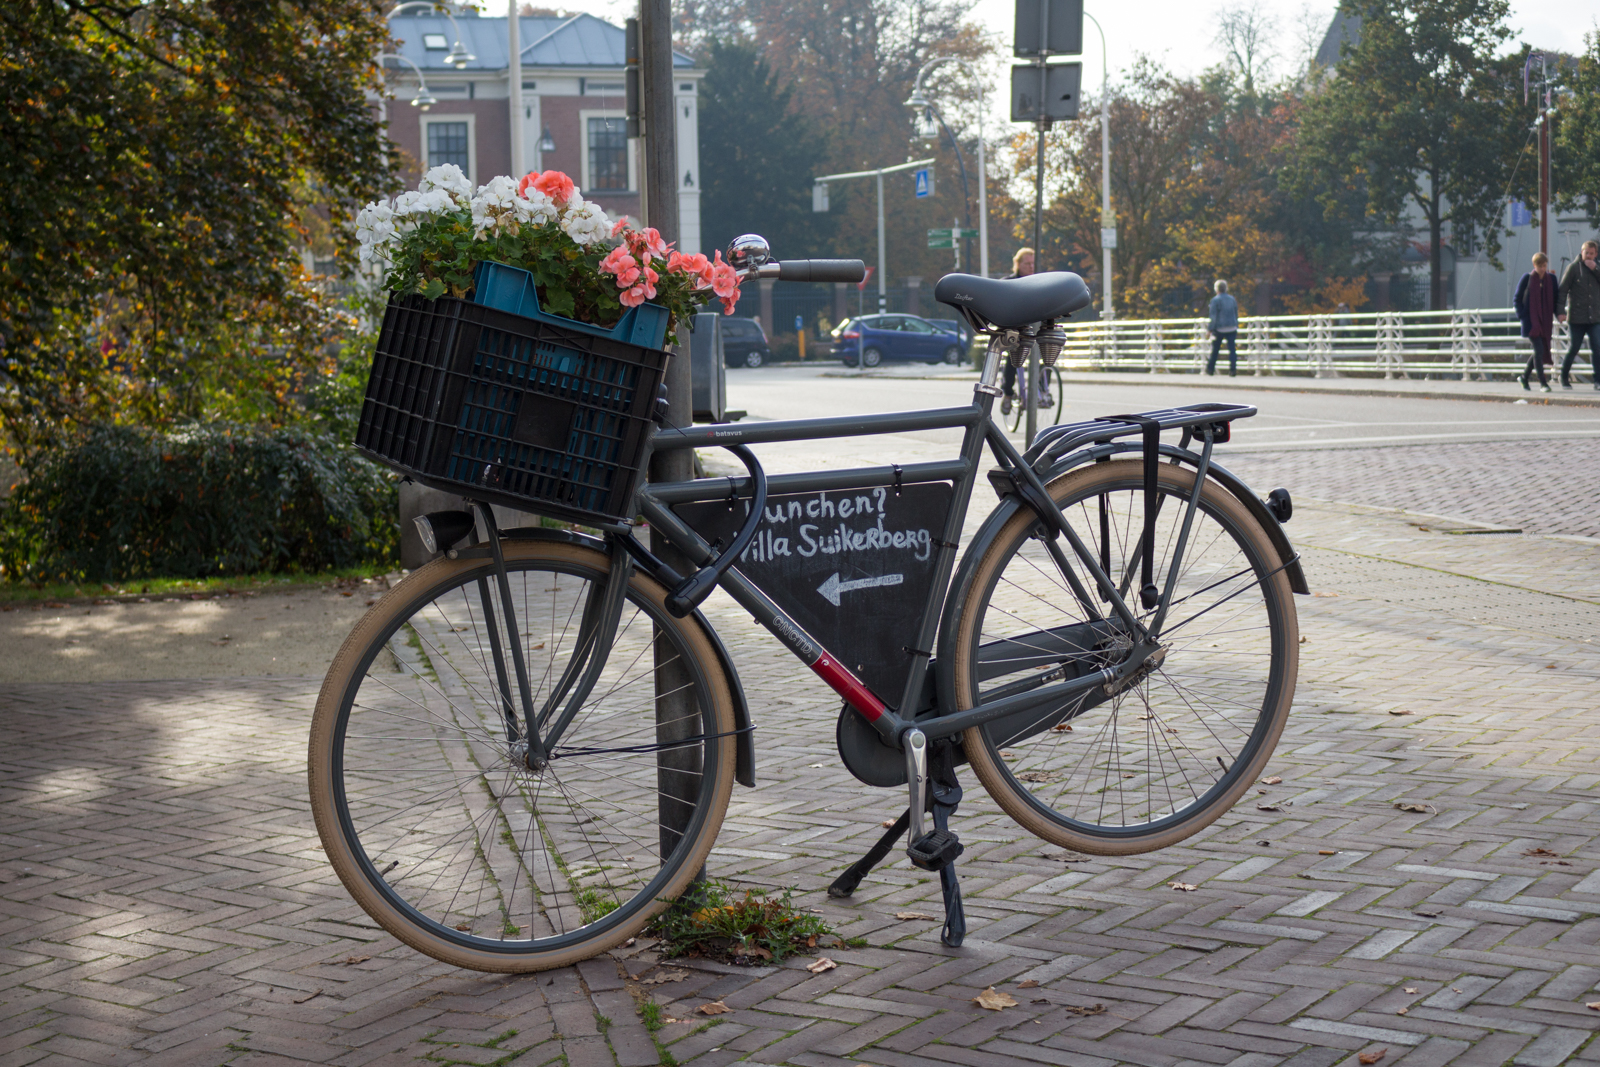 zwolle, Altstadt, Zwolle, Taxi, Fahrradtaxi, Genießertour, Hansestadt, Holland, Niederlande